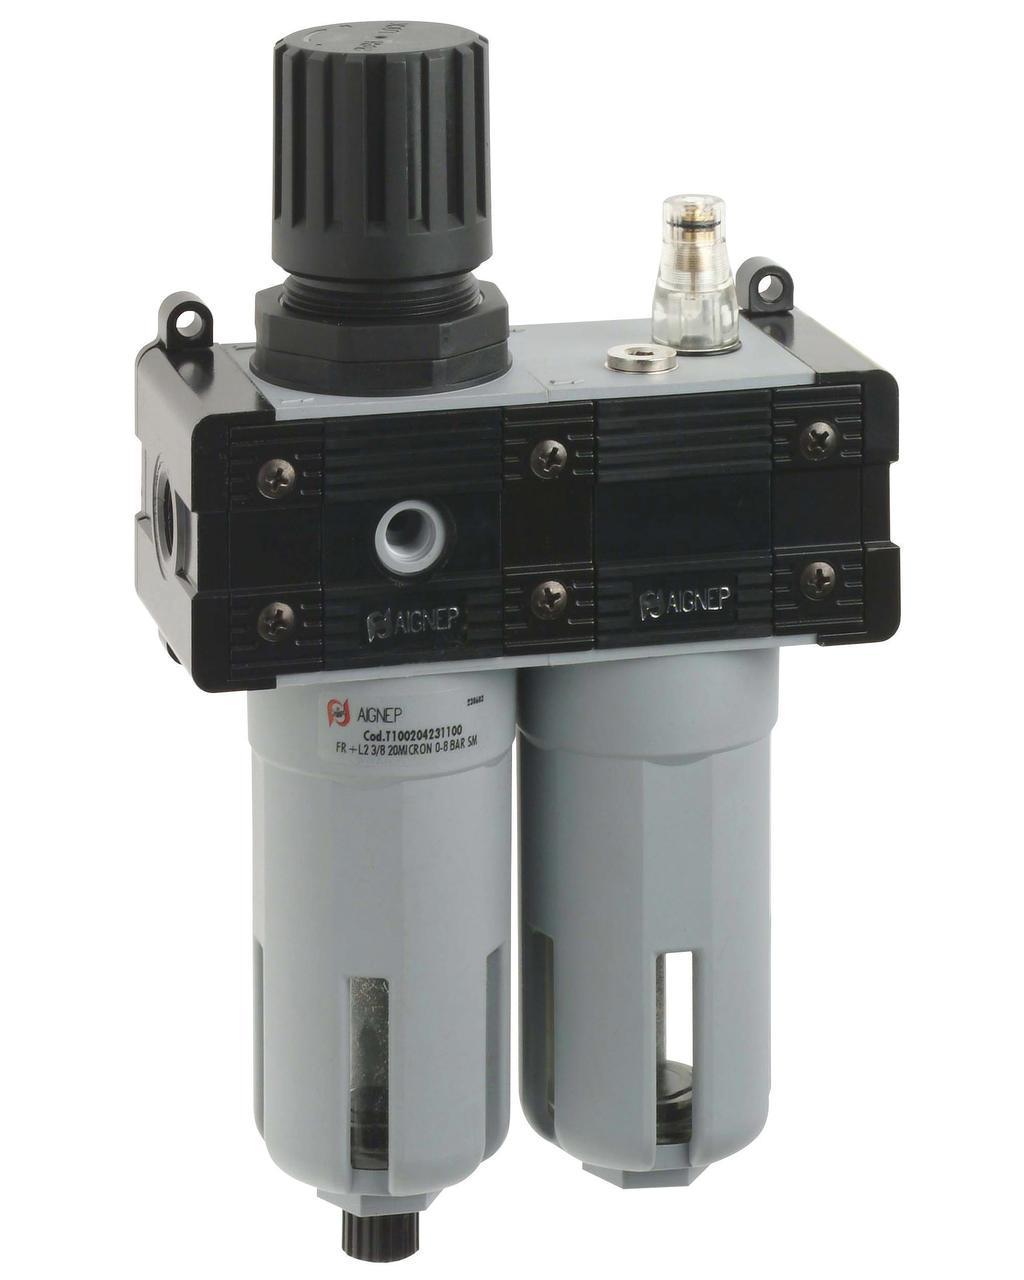 FR+L 2 1/2 Фильтр-лубрикатор, 20 микрон, 1/2, 2500 л/мин без манометра